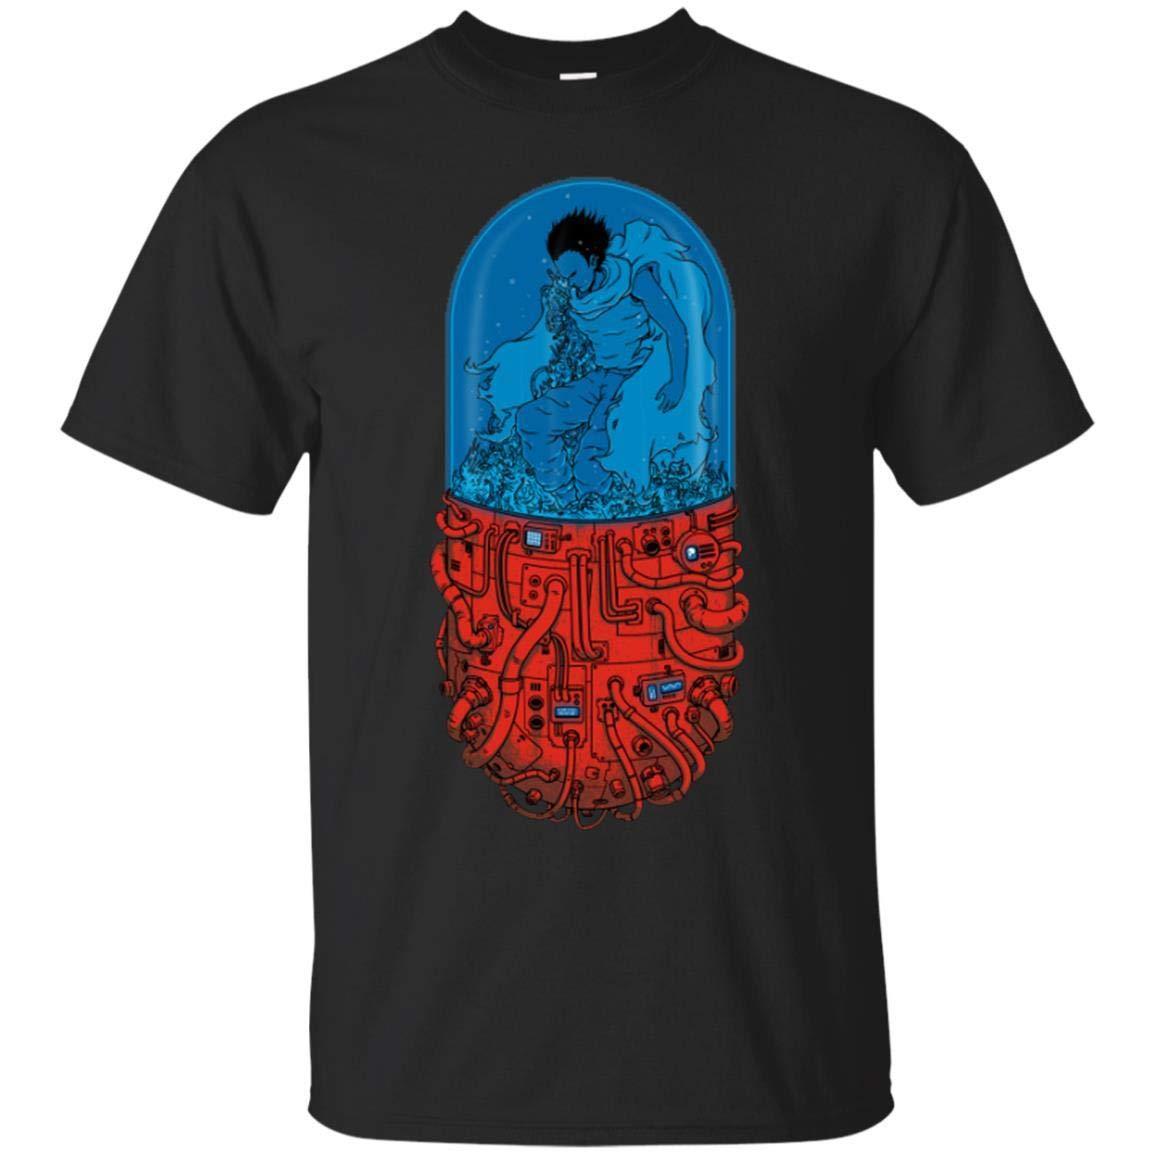 Akira Cyber Punk Capsule Pill 2019 Akira Cyberpunk Neo Tokyo Classic Retro T-Shirt G200 Gildan Ultra Cotton T-Shirt